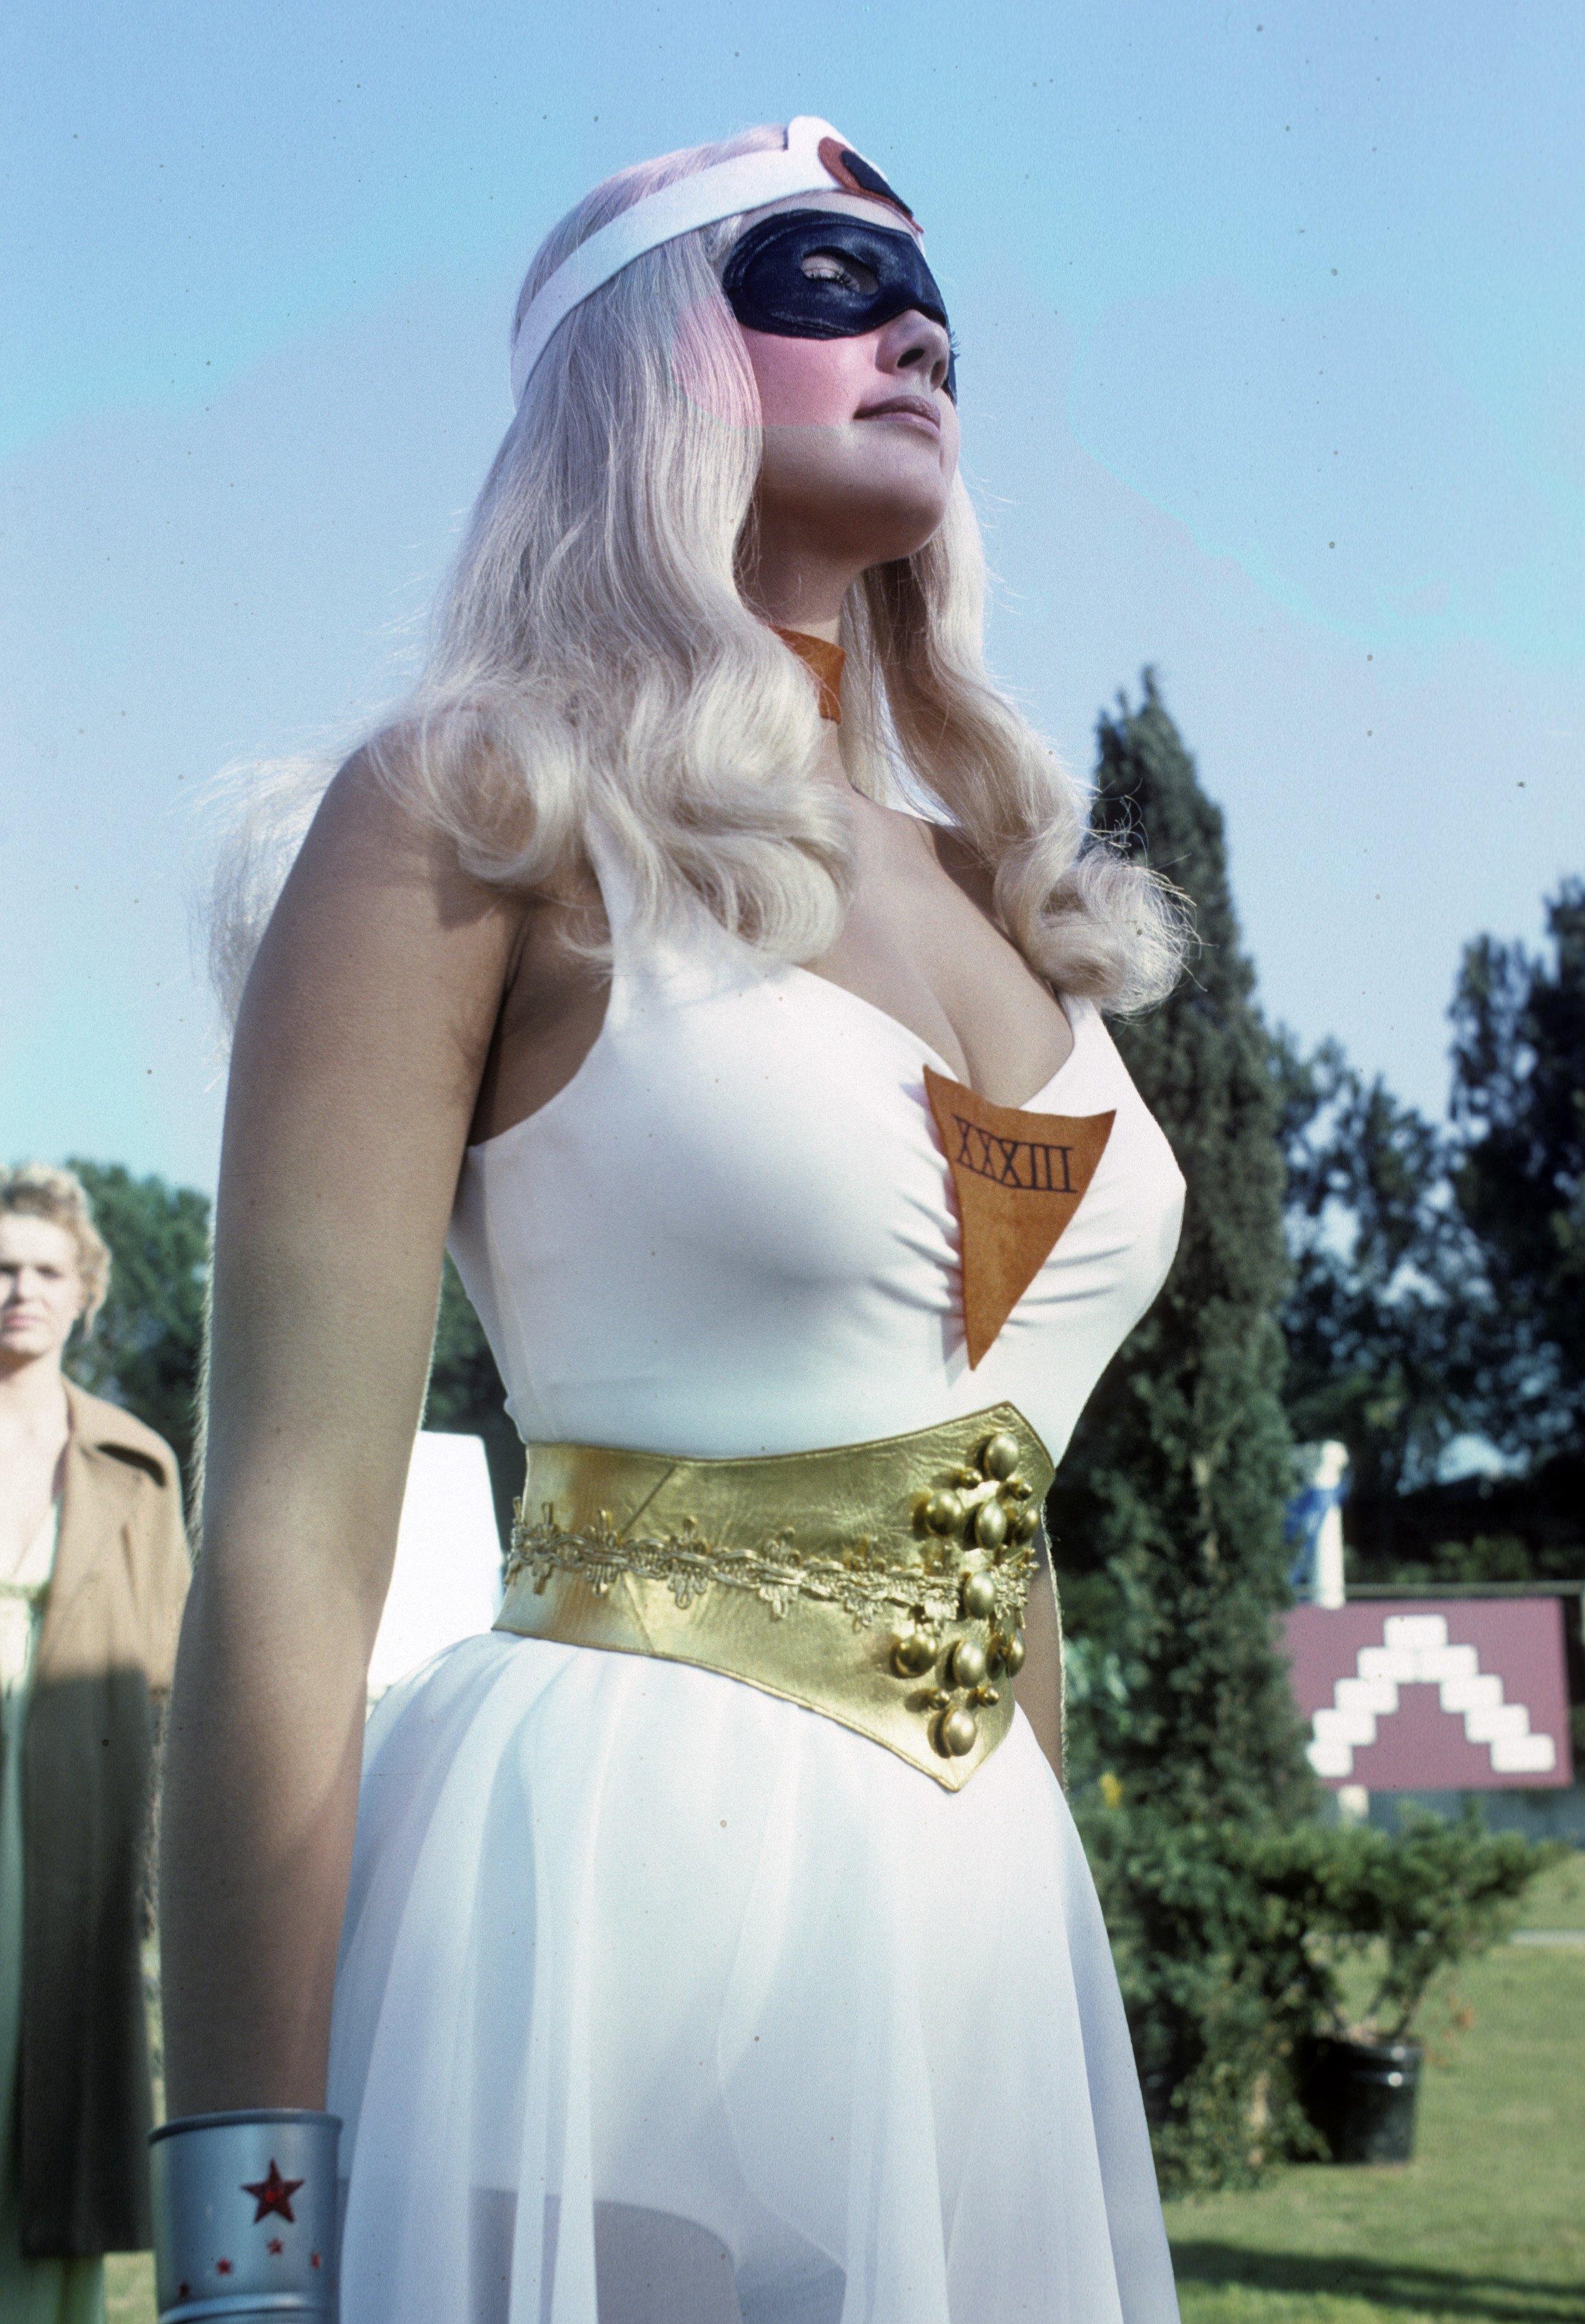 Lynda Carter in The New Original Wonder Woman (1975)